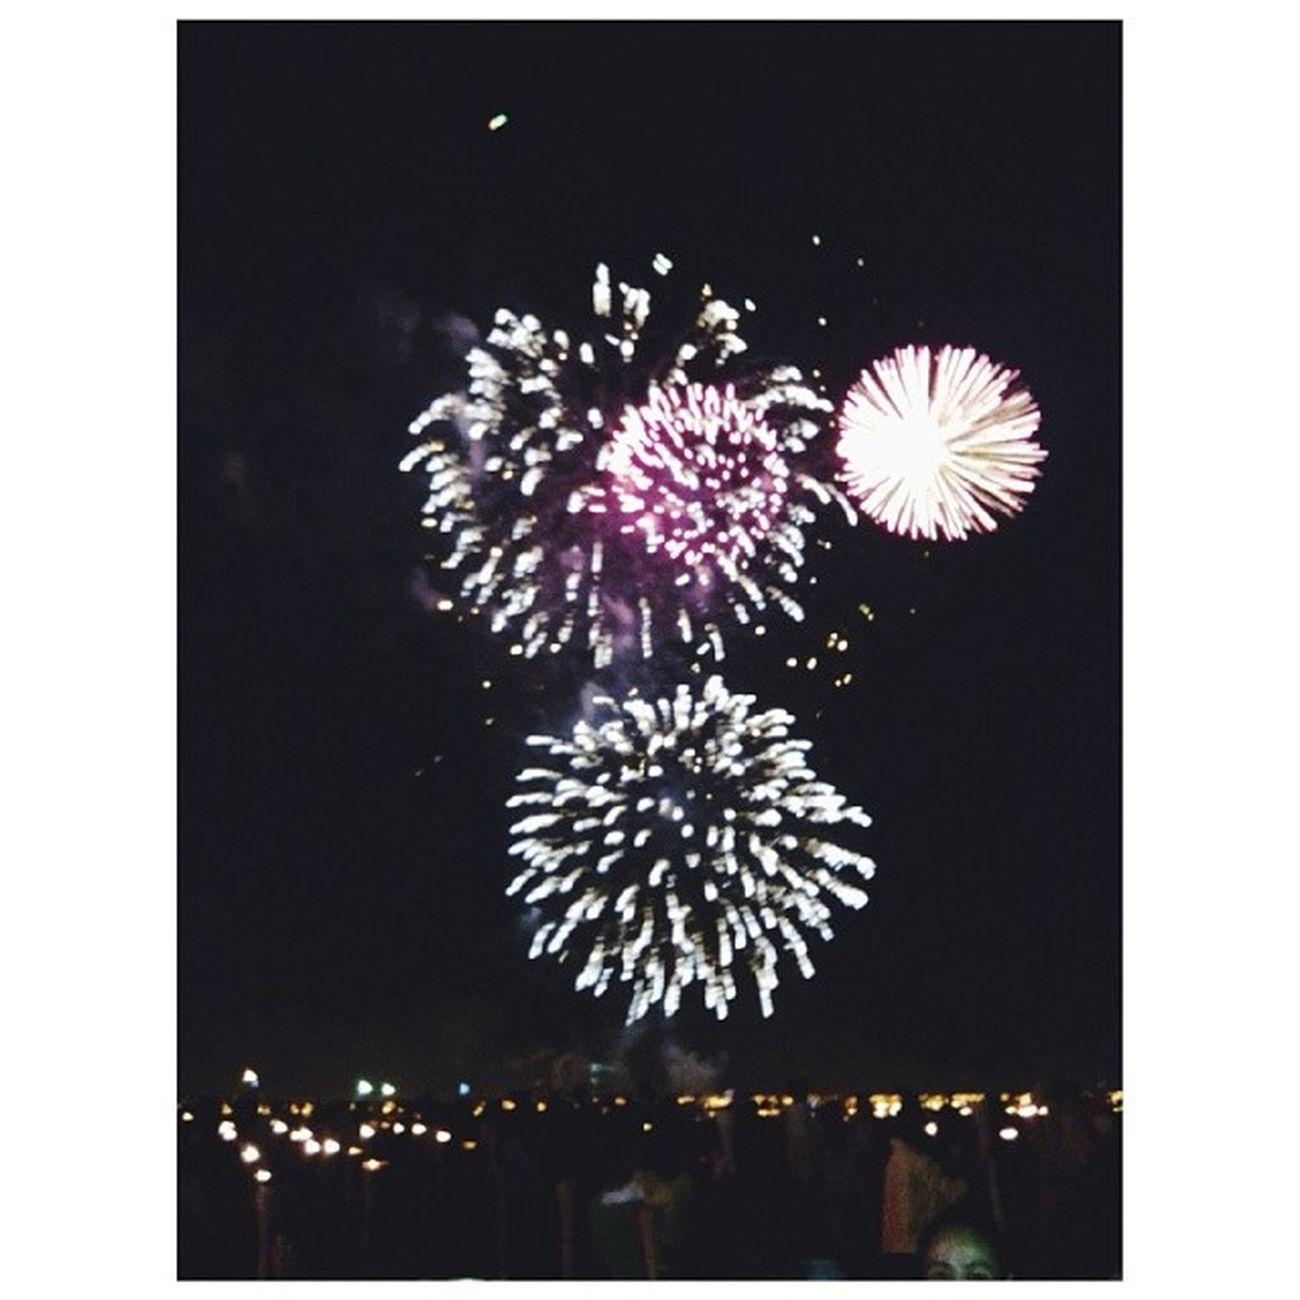 NO R E G R E T S ? Fireworks Candles LightOfPeace2014 WorldPeaceThroughInnerPeace IAmPieceOfPeace